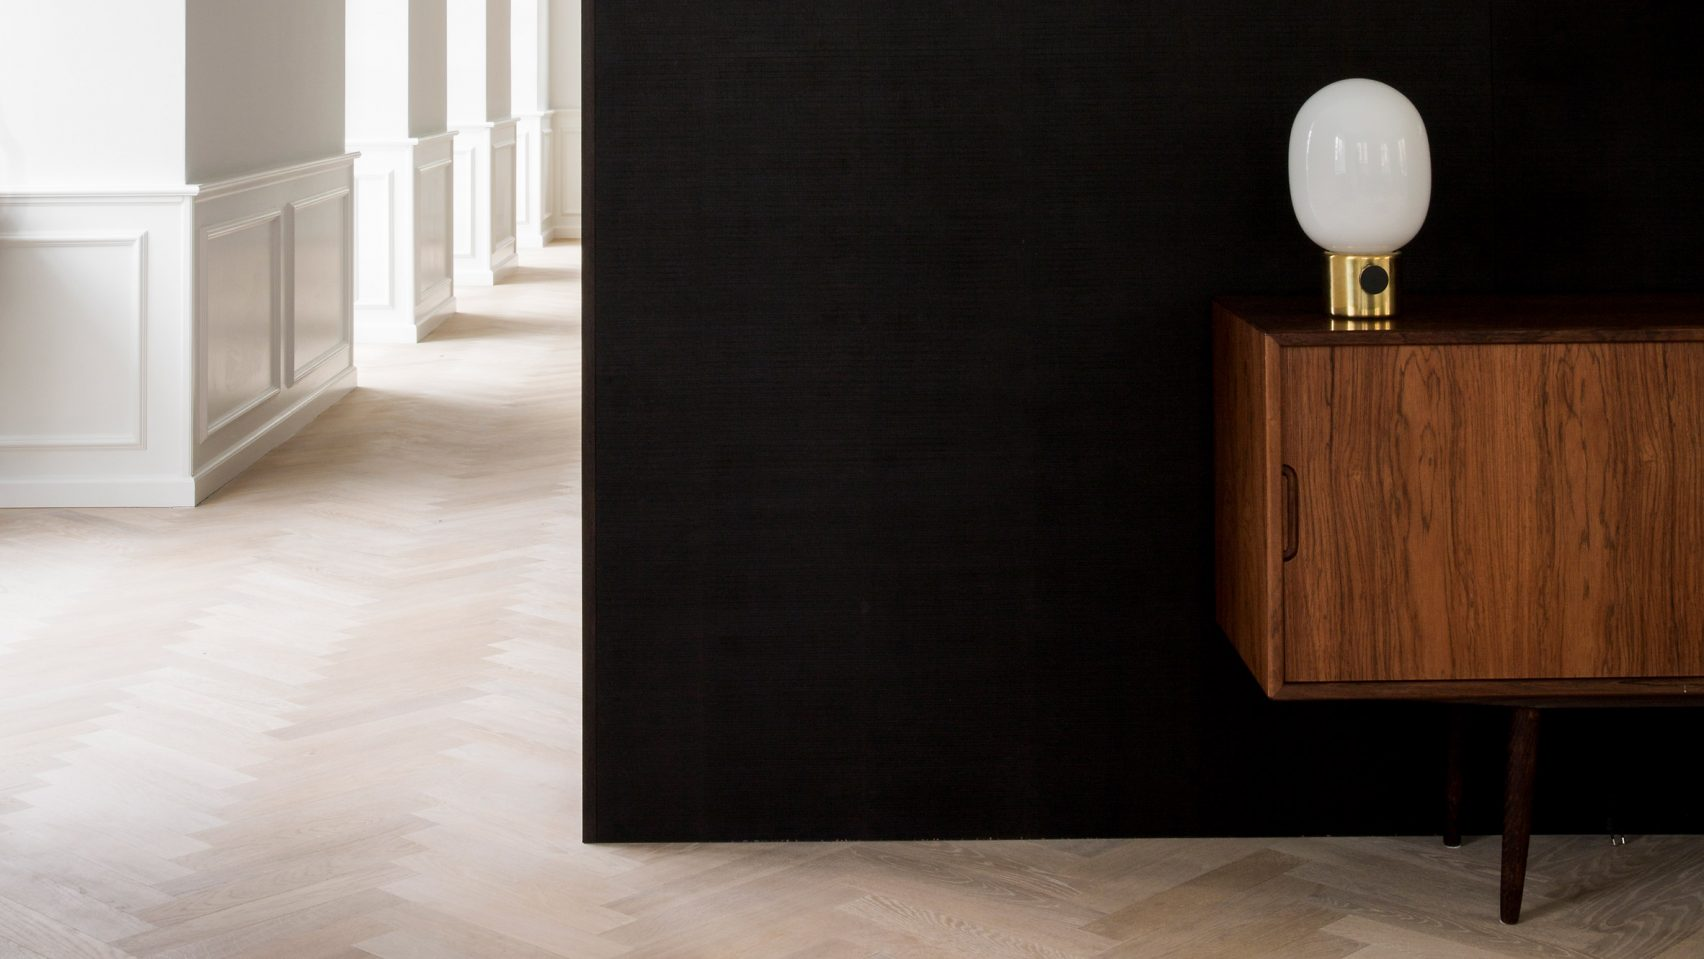 Historic copenhagen home with designer pedigree gets minimalist refresh